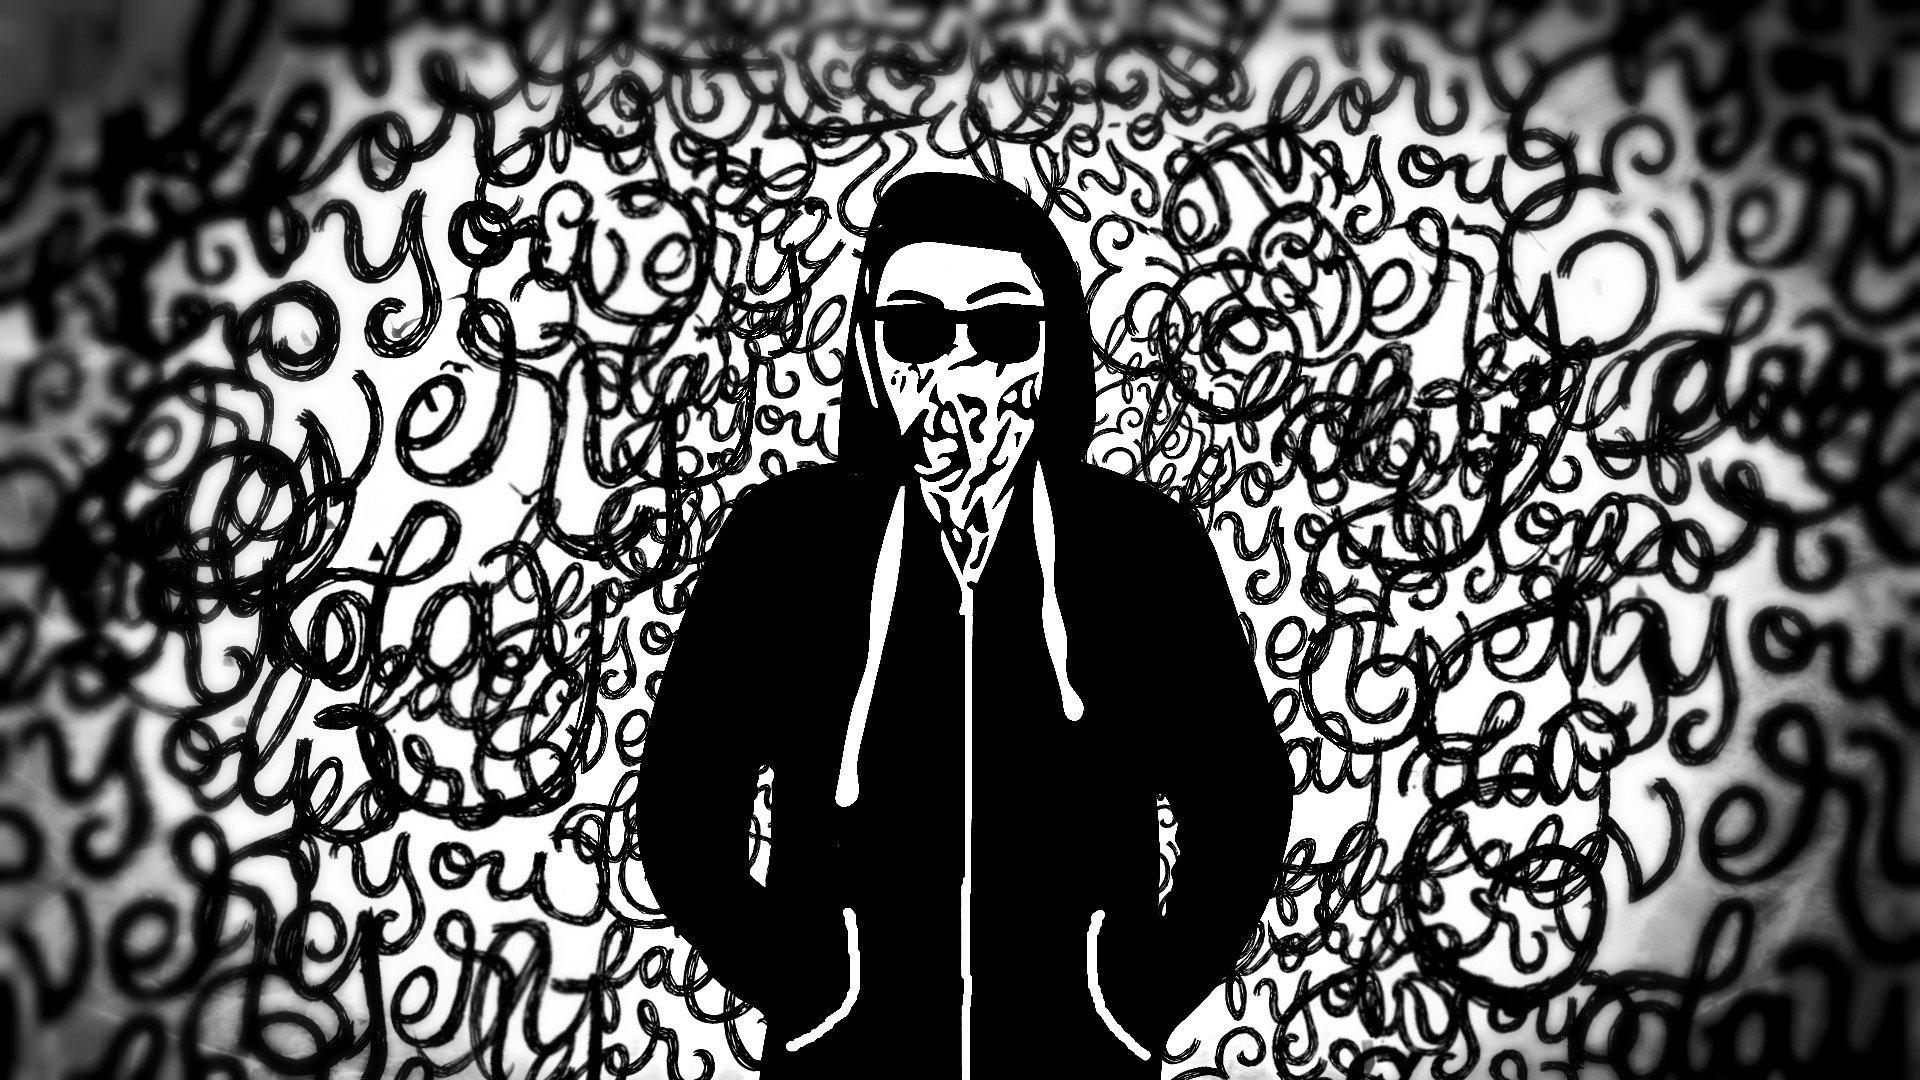 Masaüstü 1920x1080 Piksel Siyah Erik Boyama Wderikskate Beyaz